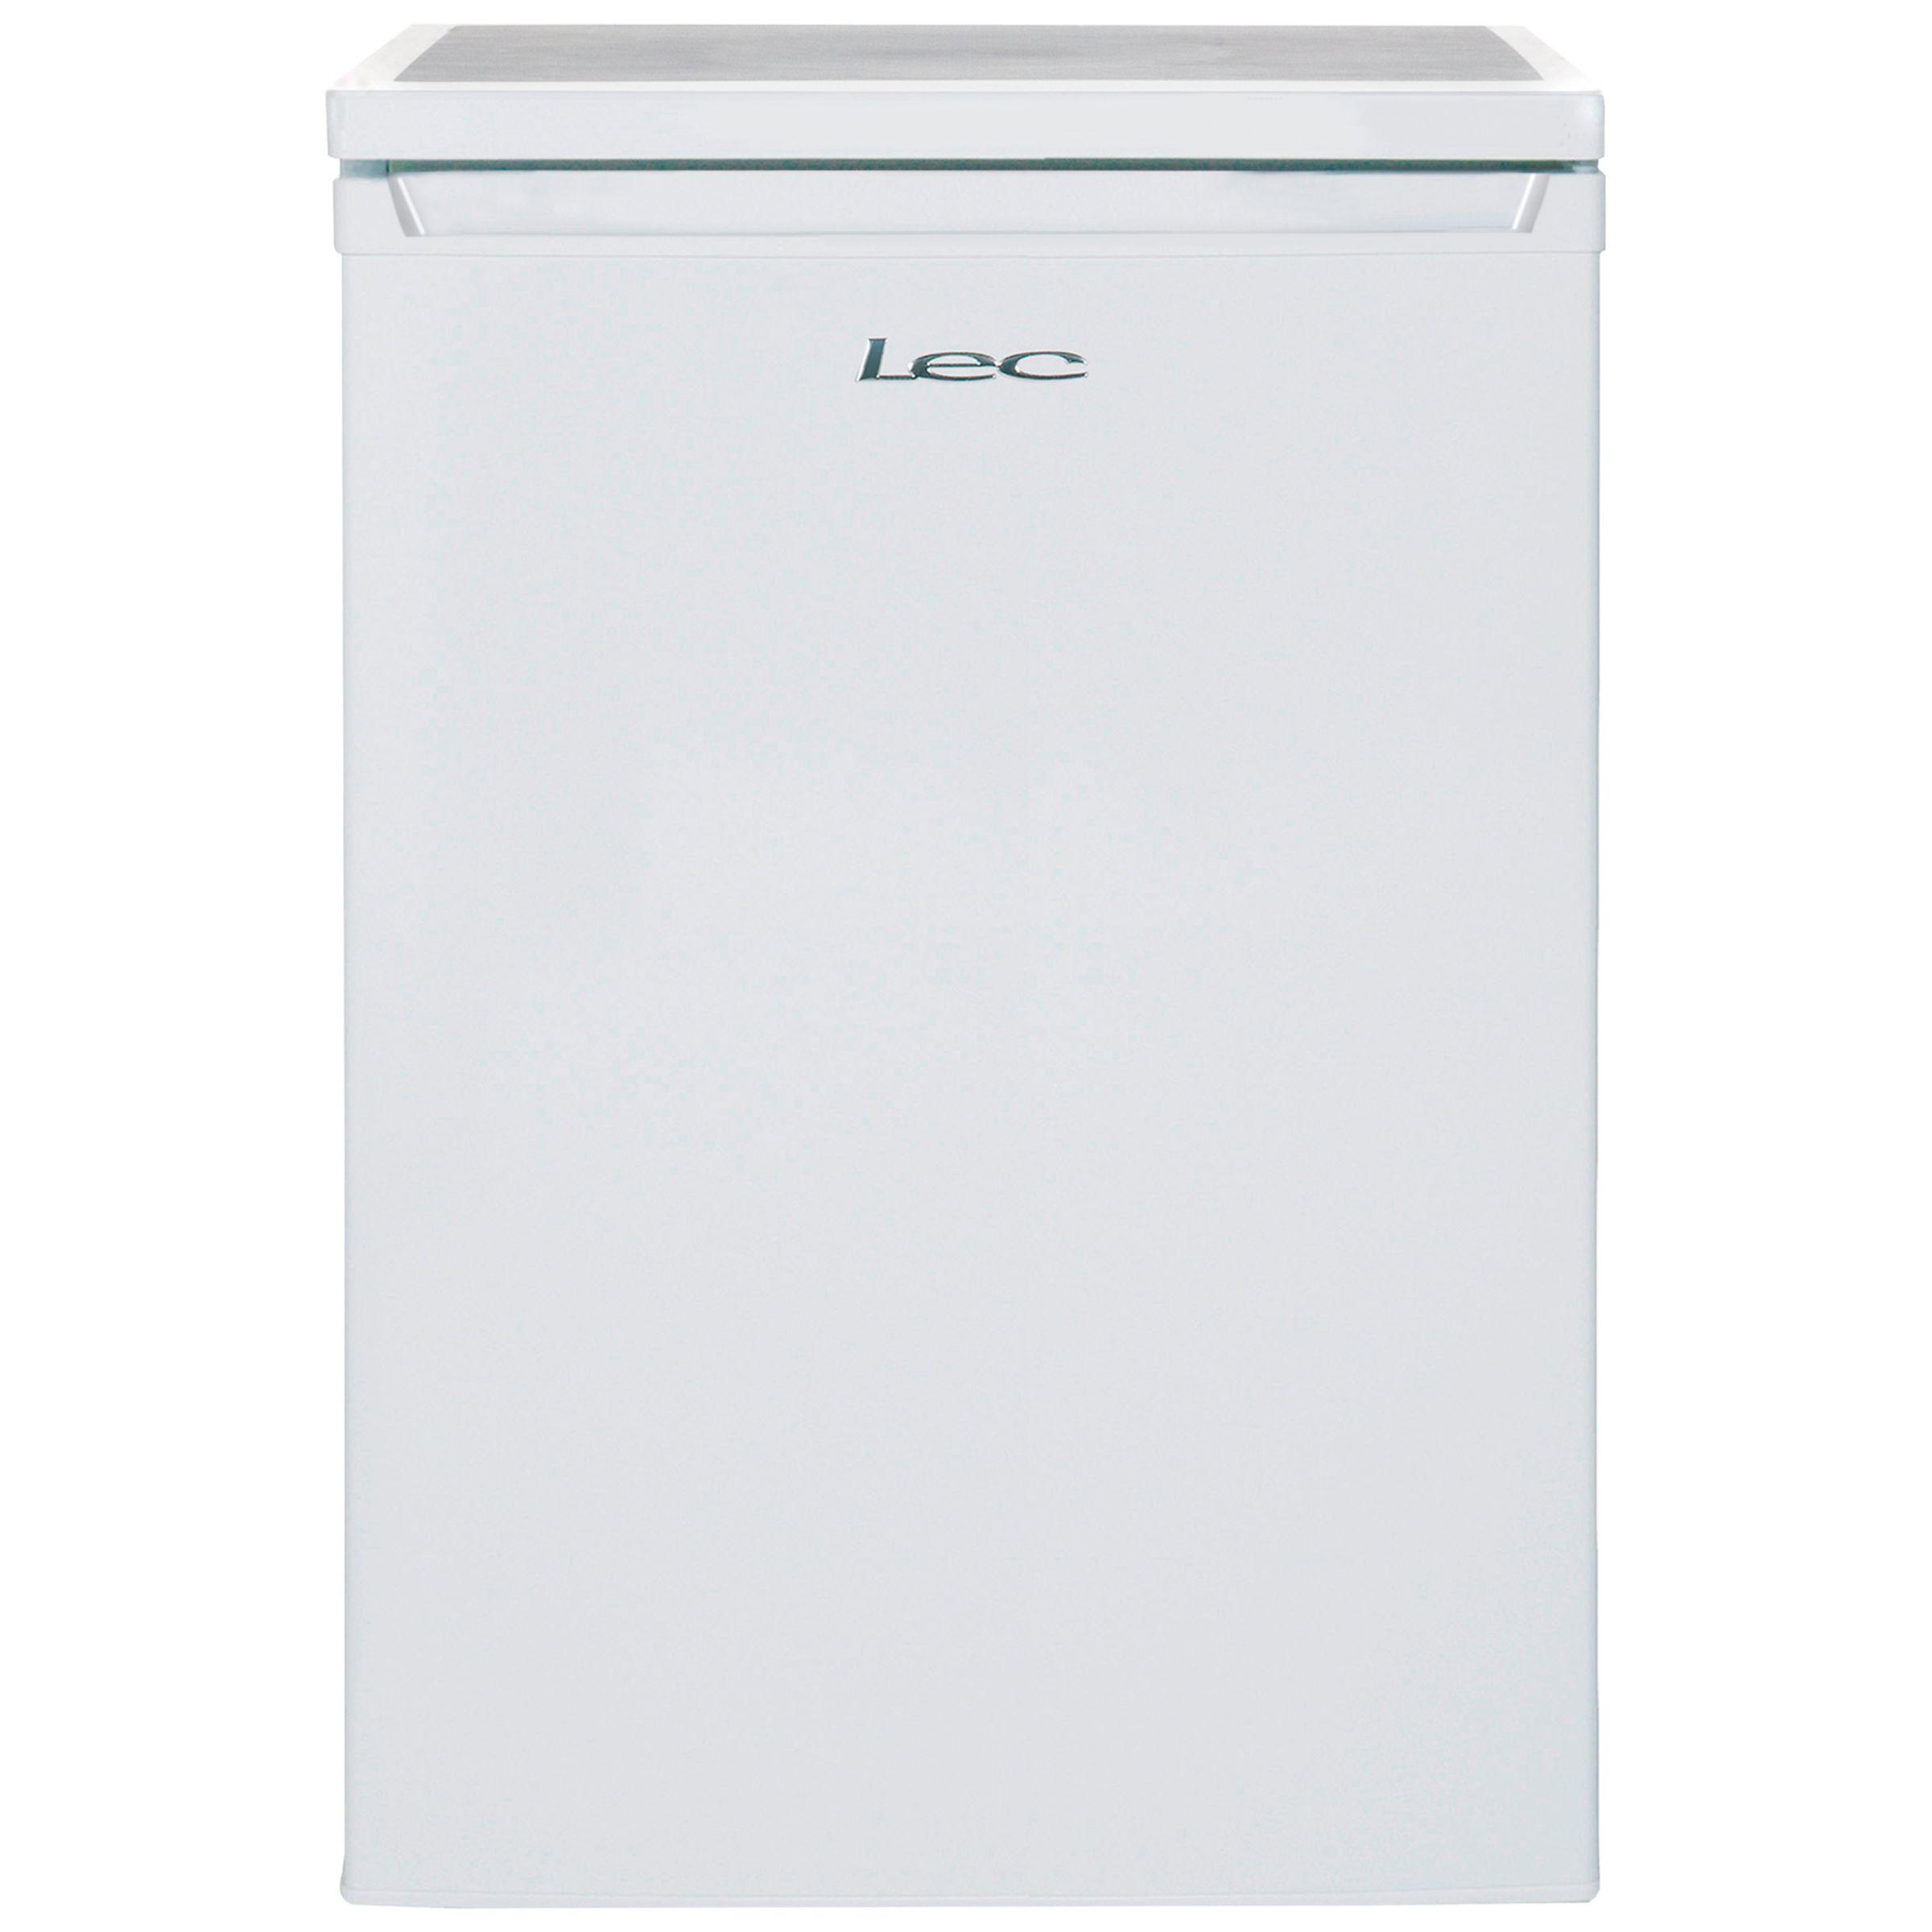 LEC Lec L6014W Undercounter Larder Fridge, A+ Energy Rating, 60cm Wide, White